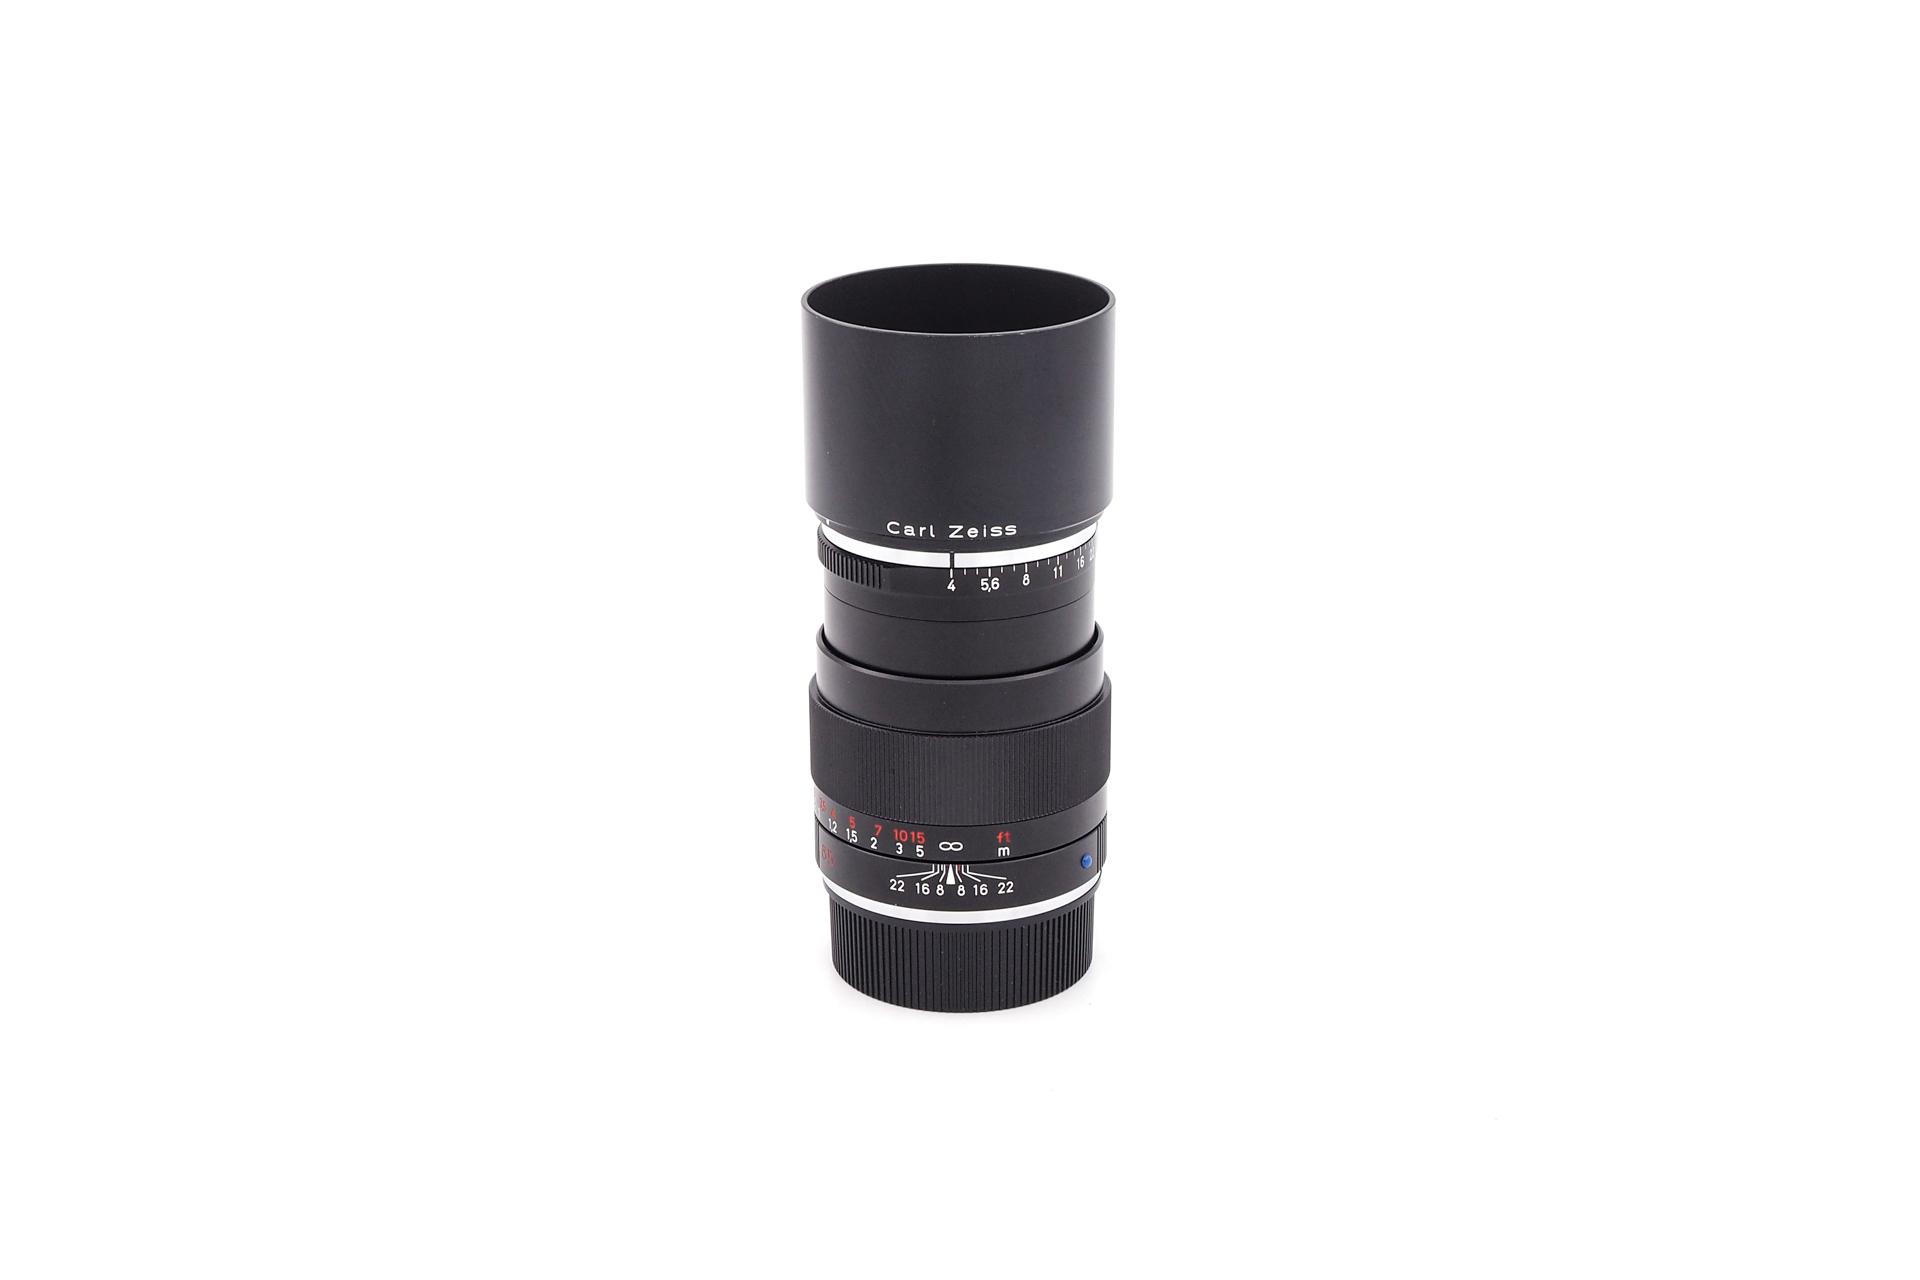 Carl Zeiss 85mm F/4  Tele-Tessar ZM